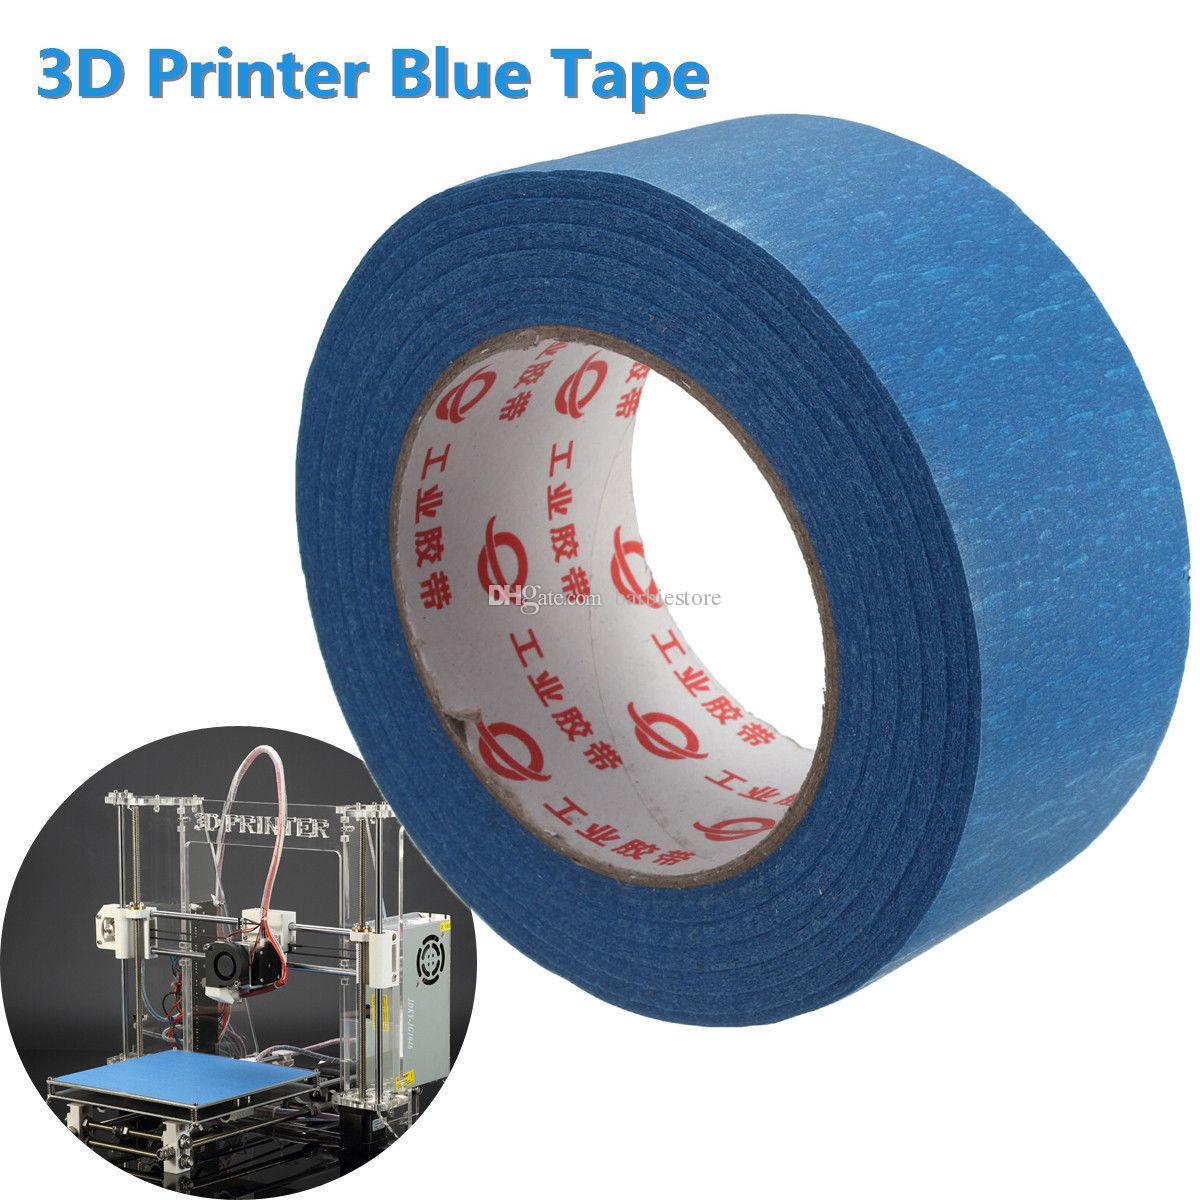 Para Reprap Impresora 3D 50mx50mm Blue Tape Pintores Herramienta de enmascaramiento de impresión B00046 BARD